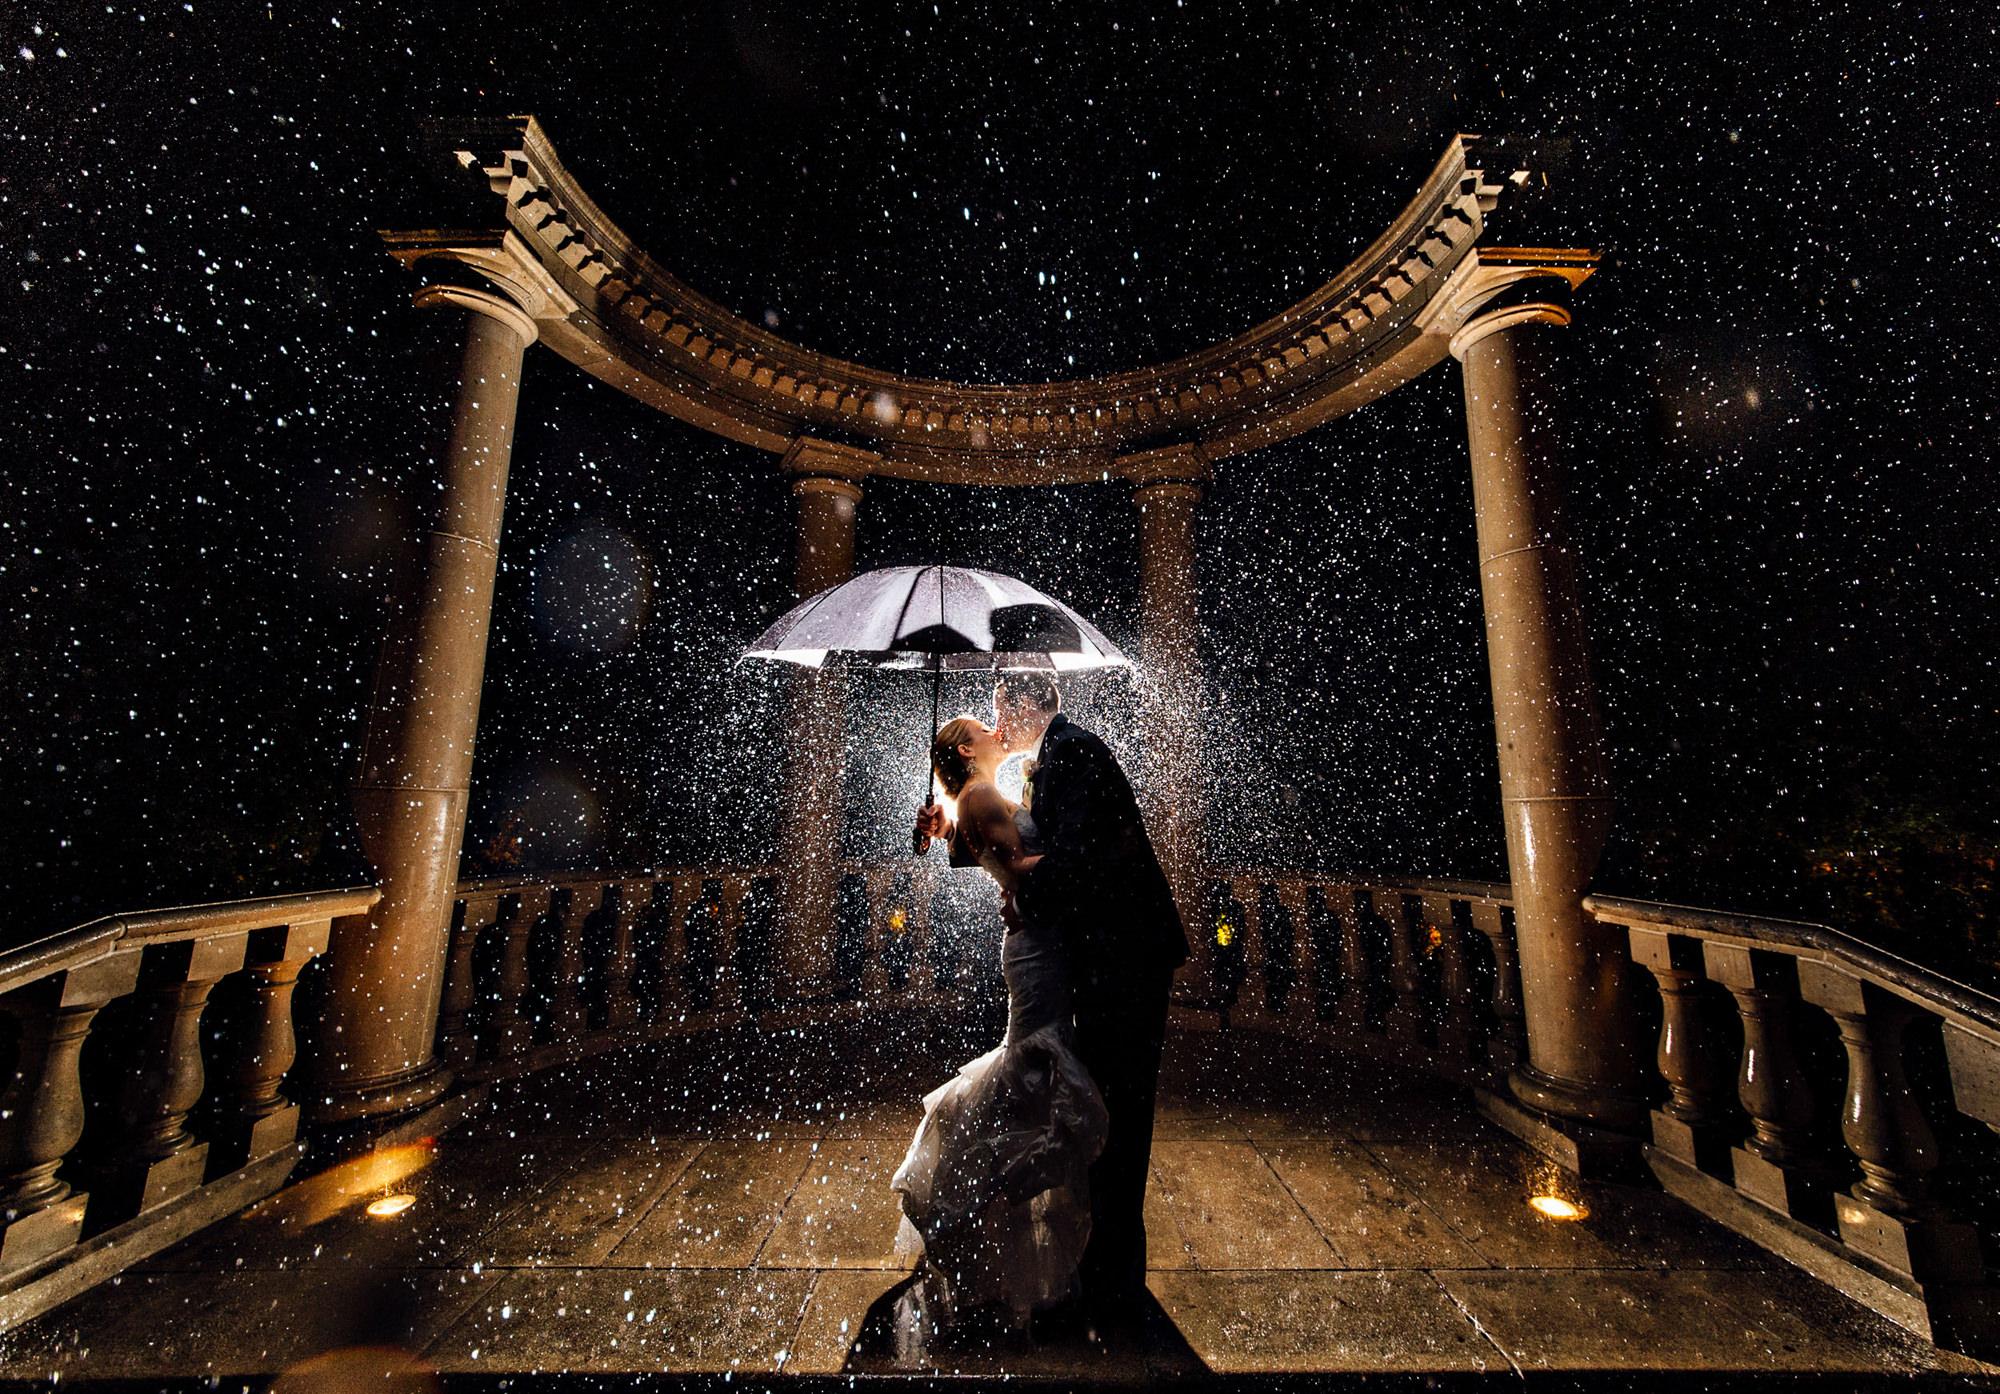 epic-bride-and-groom-portrait-under-umbrella-in-rain-worlds-best-wedding-photos-the-brenizers-new-york-wedding-photographers